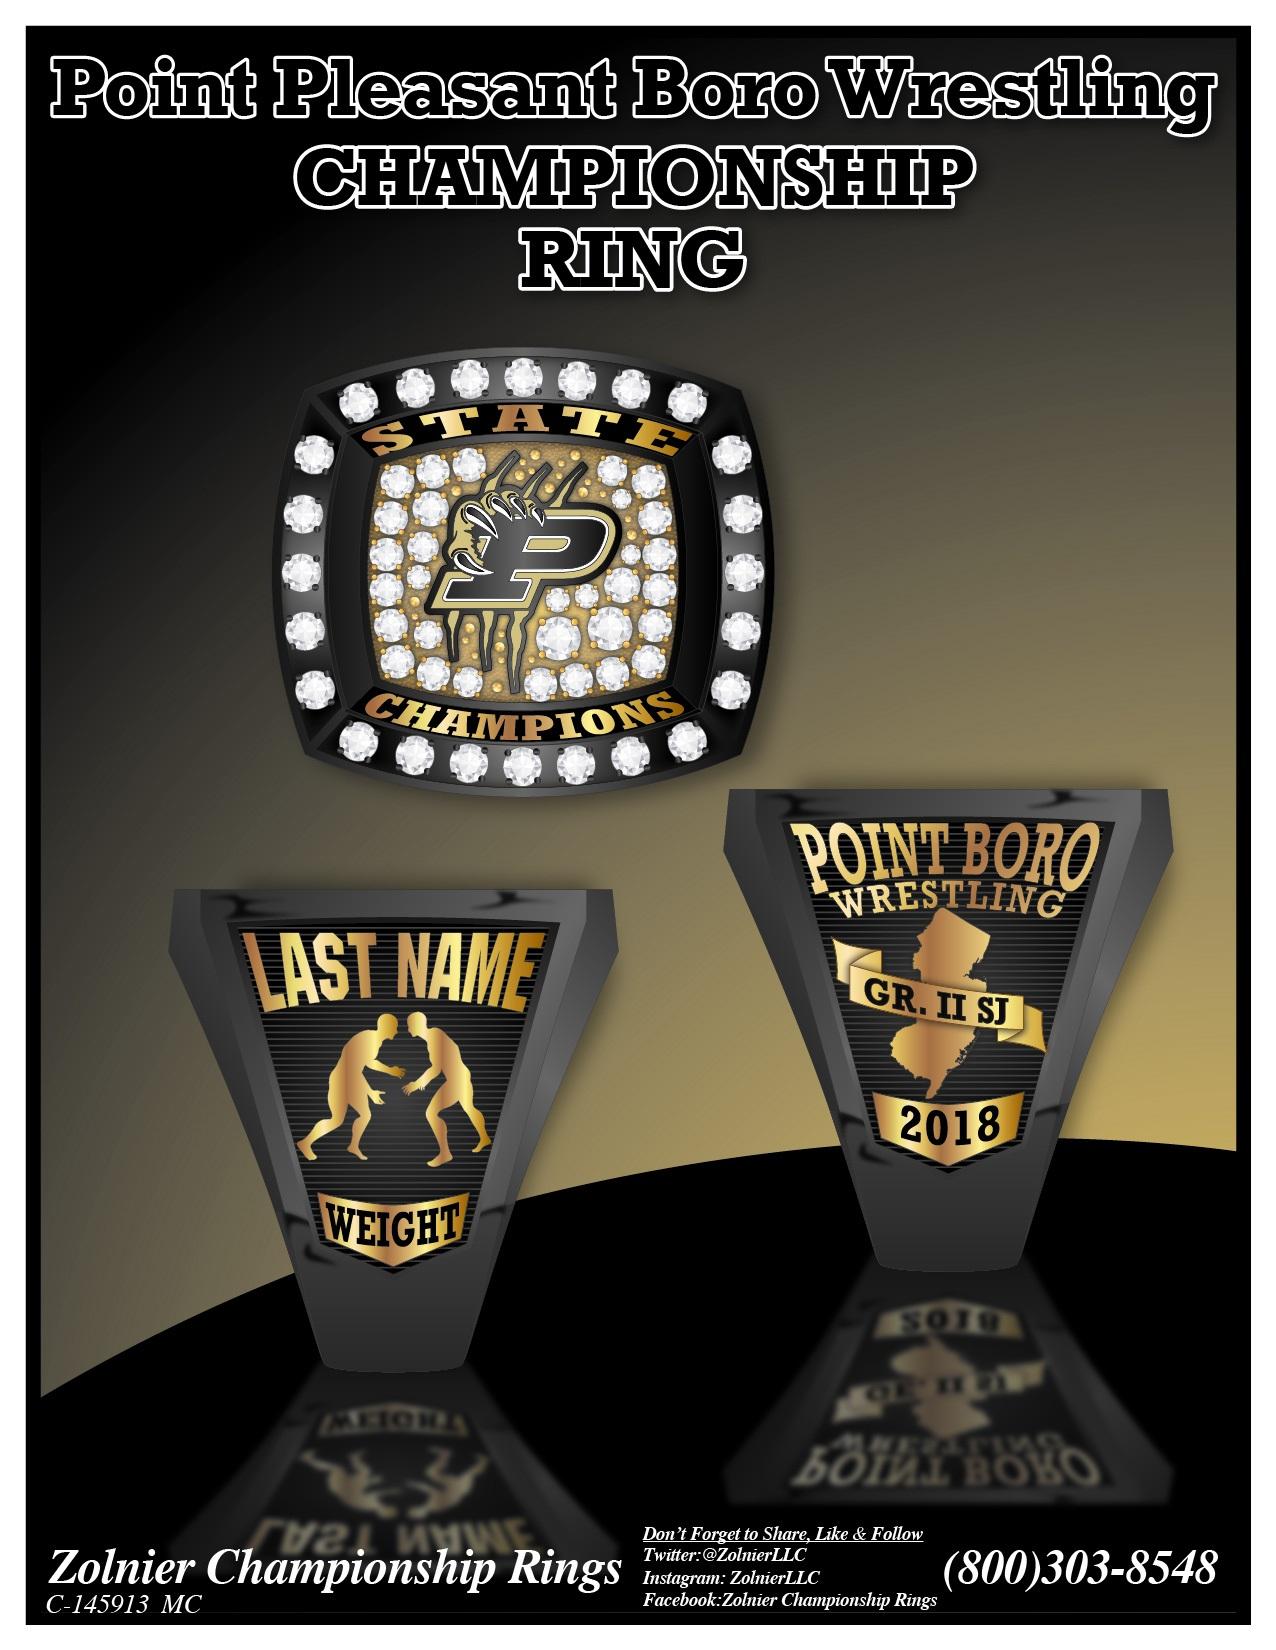 C-145913 Point Pleasant Boro Wrestling Champ Ring